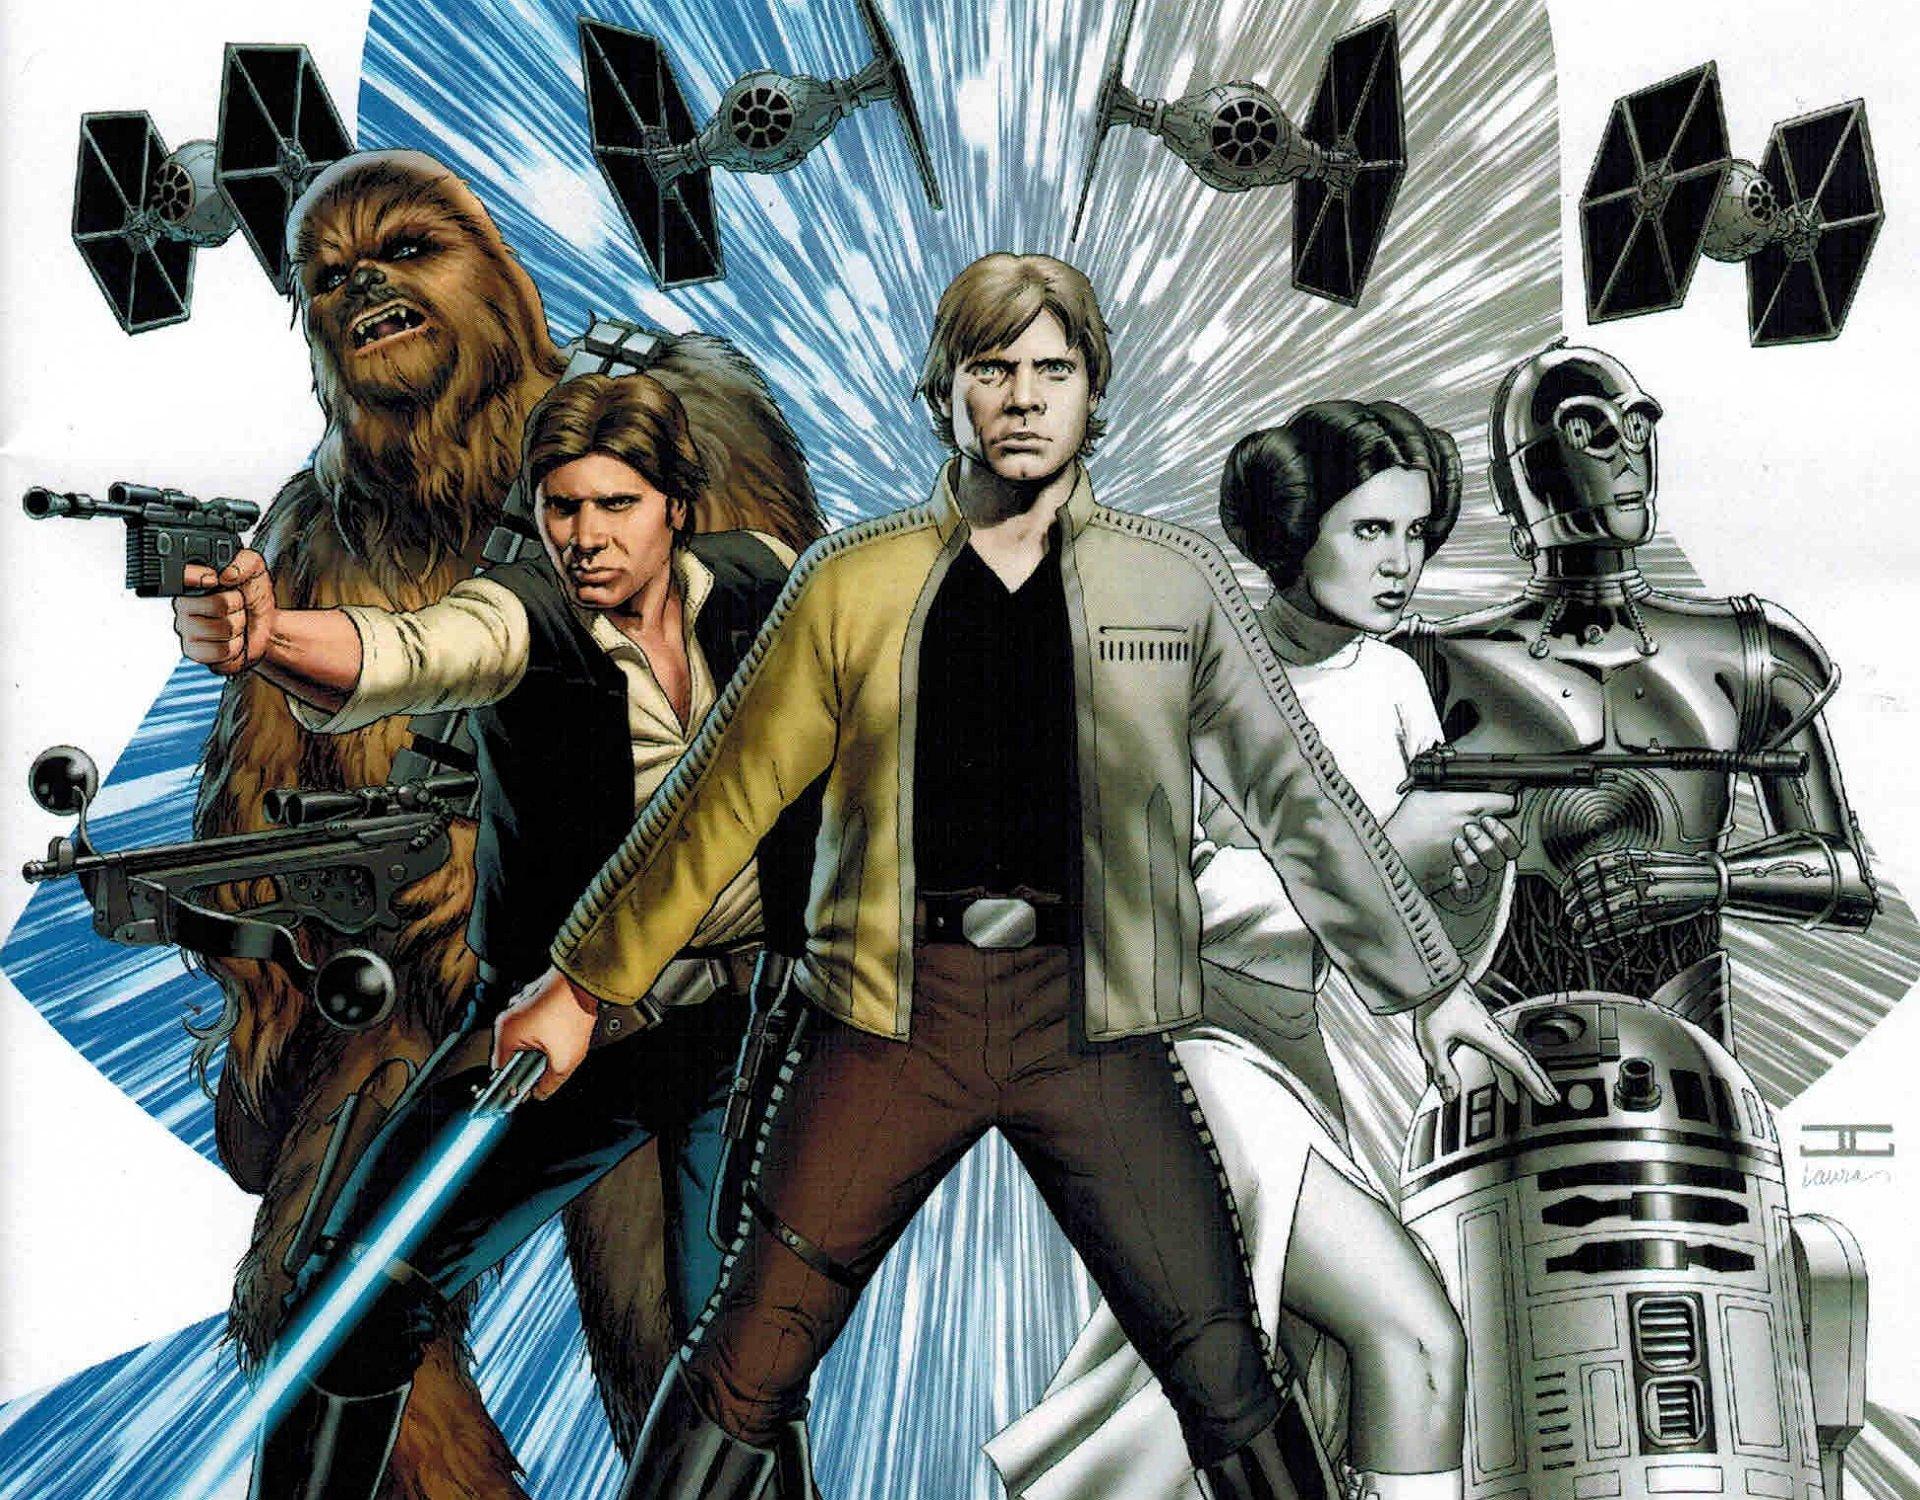 Marvel Star Wars Sci Fi Futuristic Action Comics Adventure 1920x1500 Download Hd Wallpaper Wallpapertip